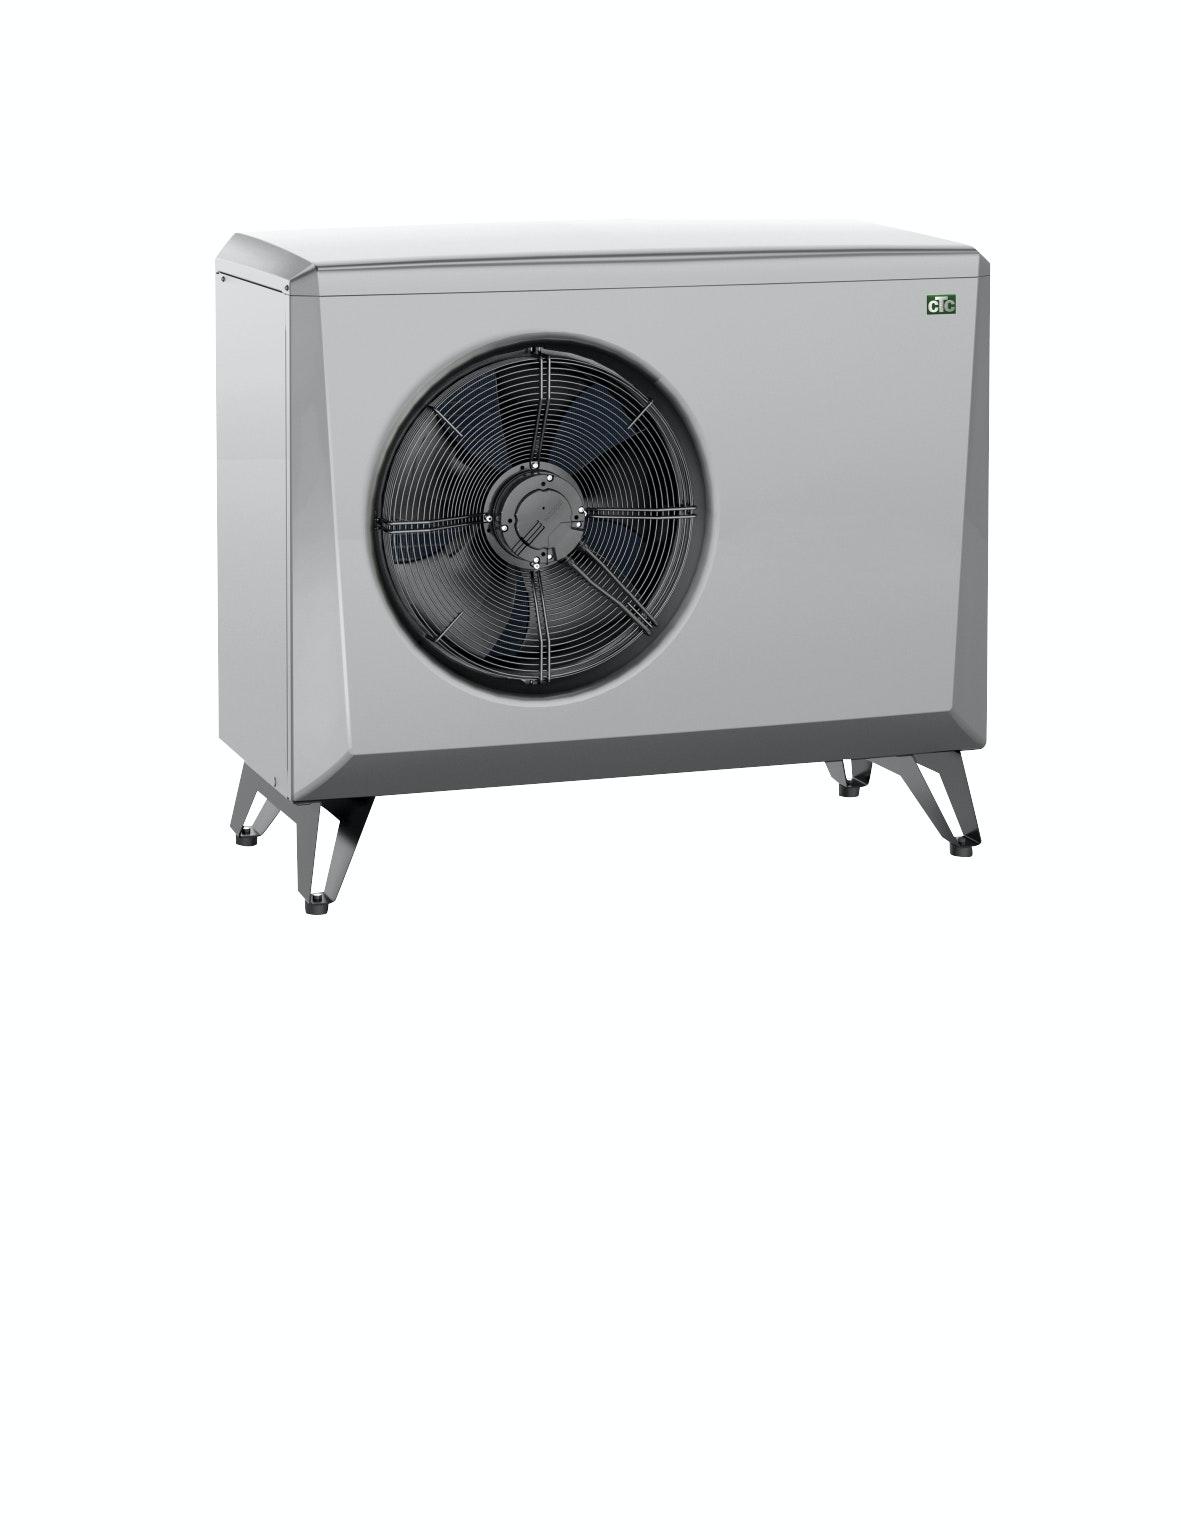 Luft-/Vattenvärmepump CTC Utedel Ecoair 406 A++